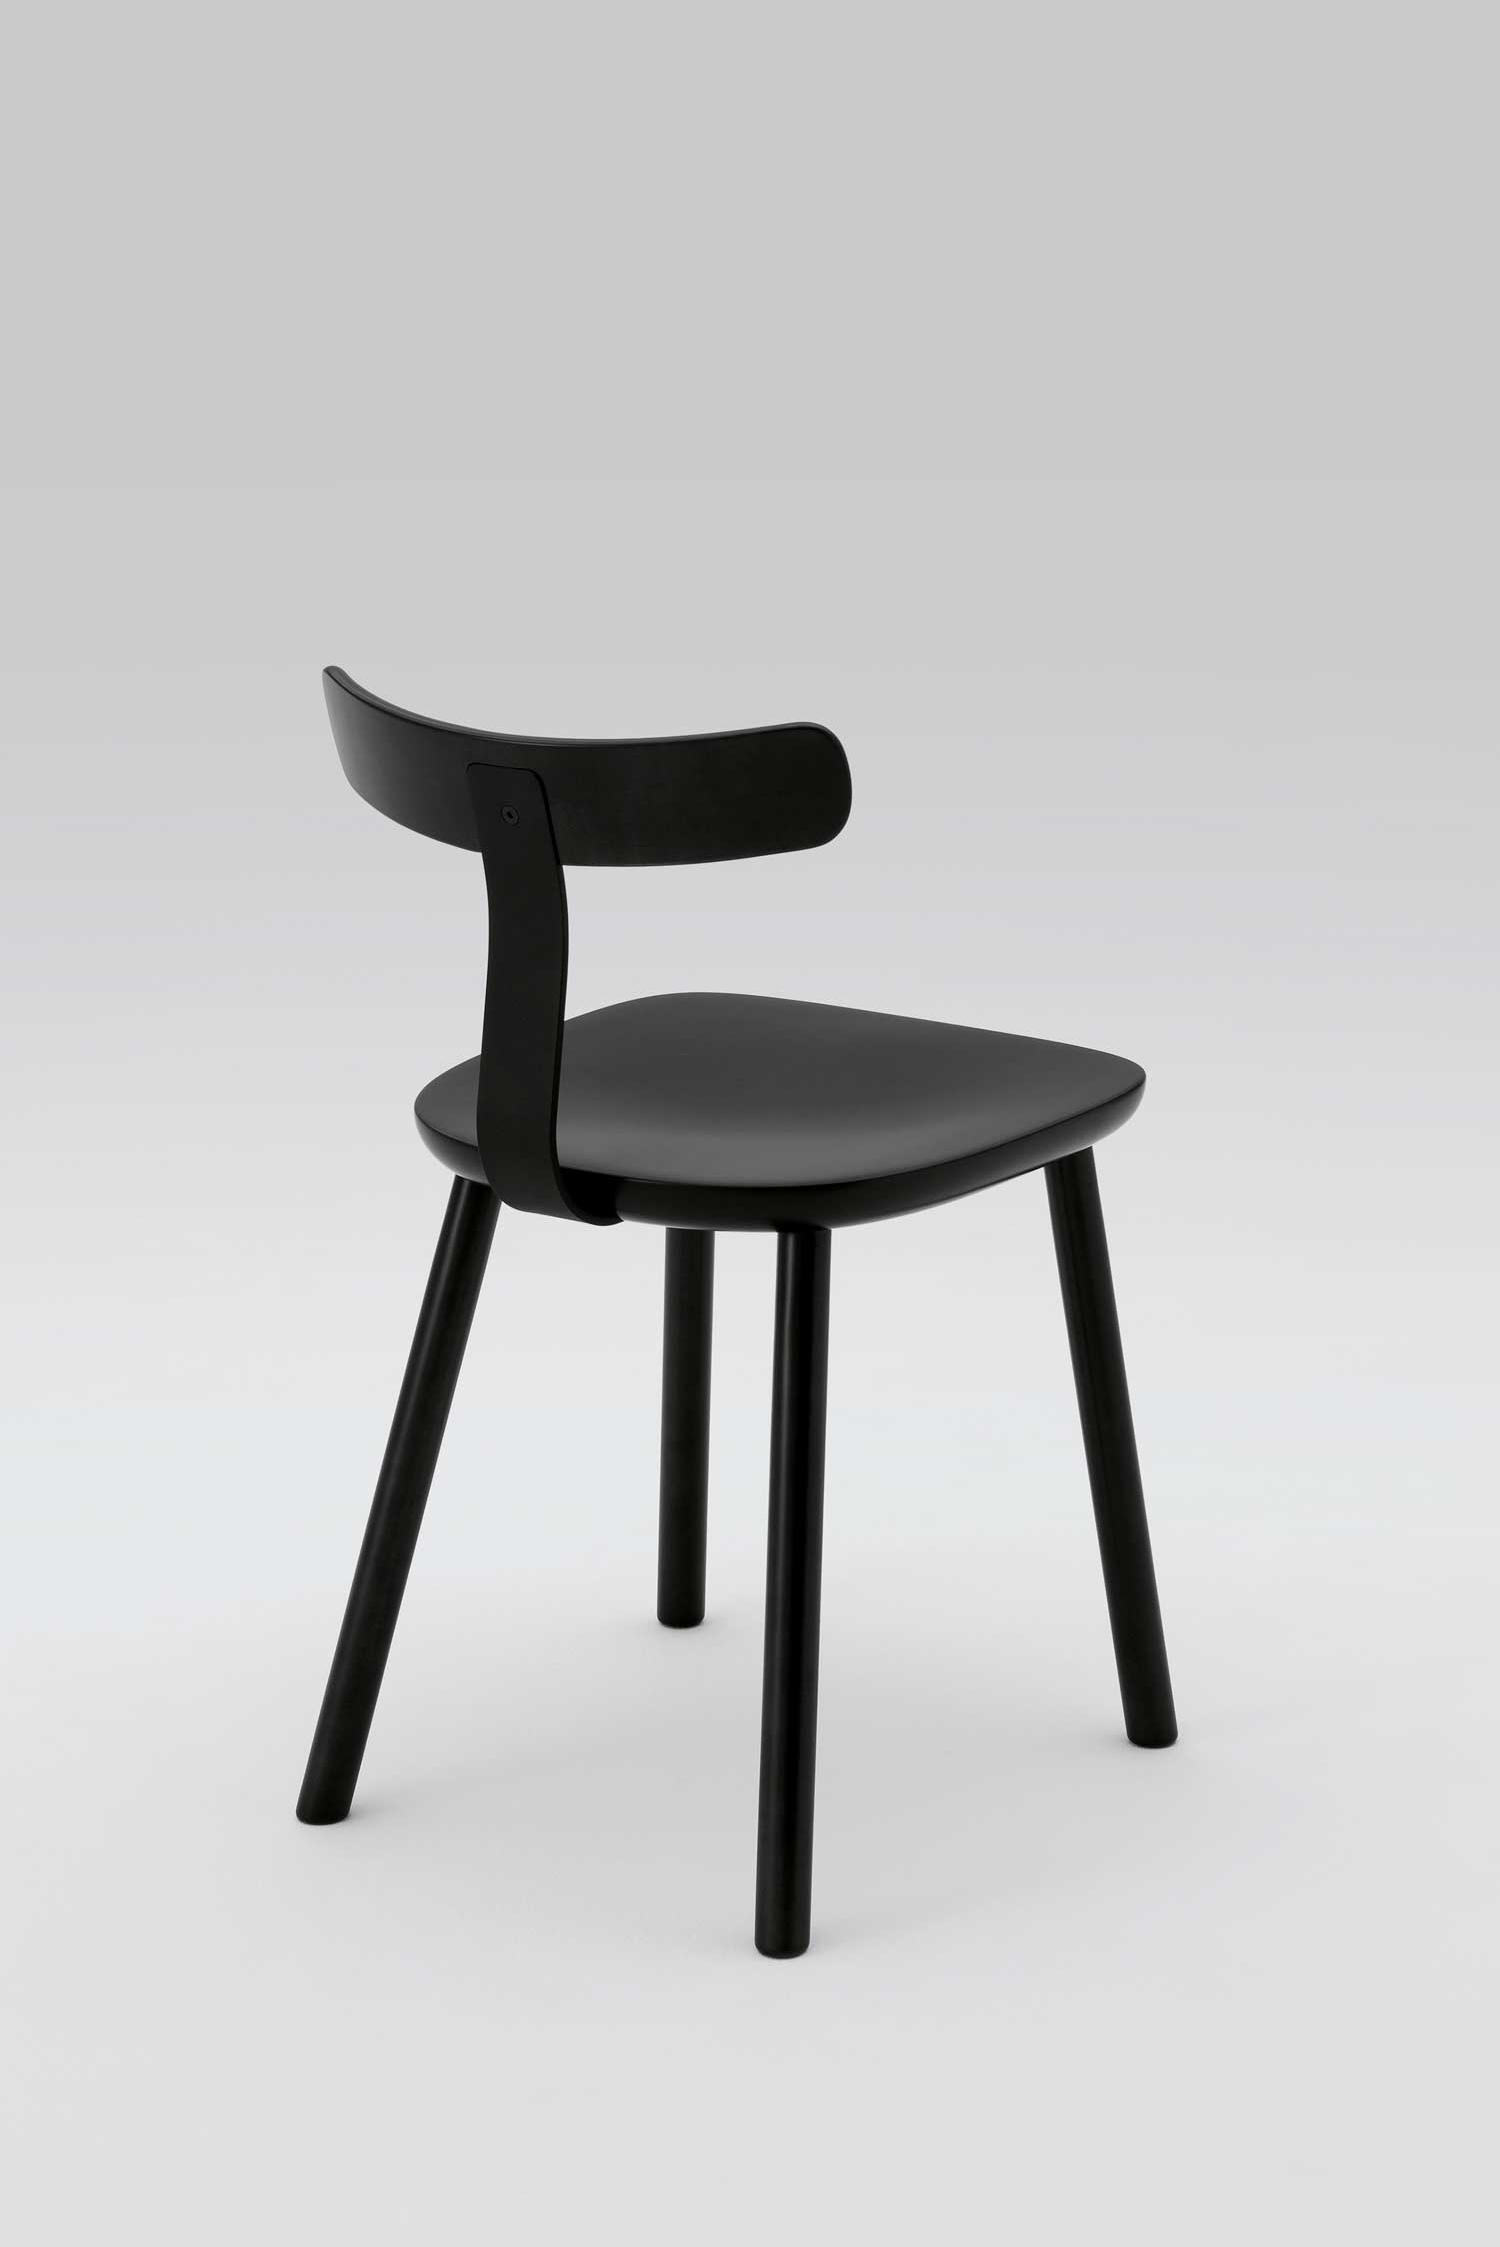 Maruni Chair at Salone del Mobile 2017 | Yellowtrace